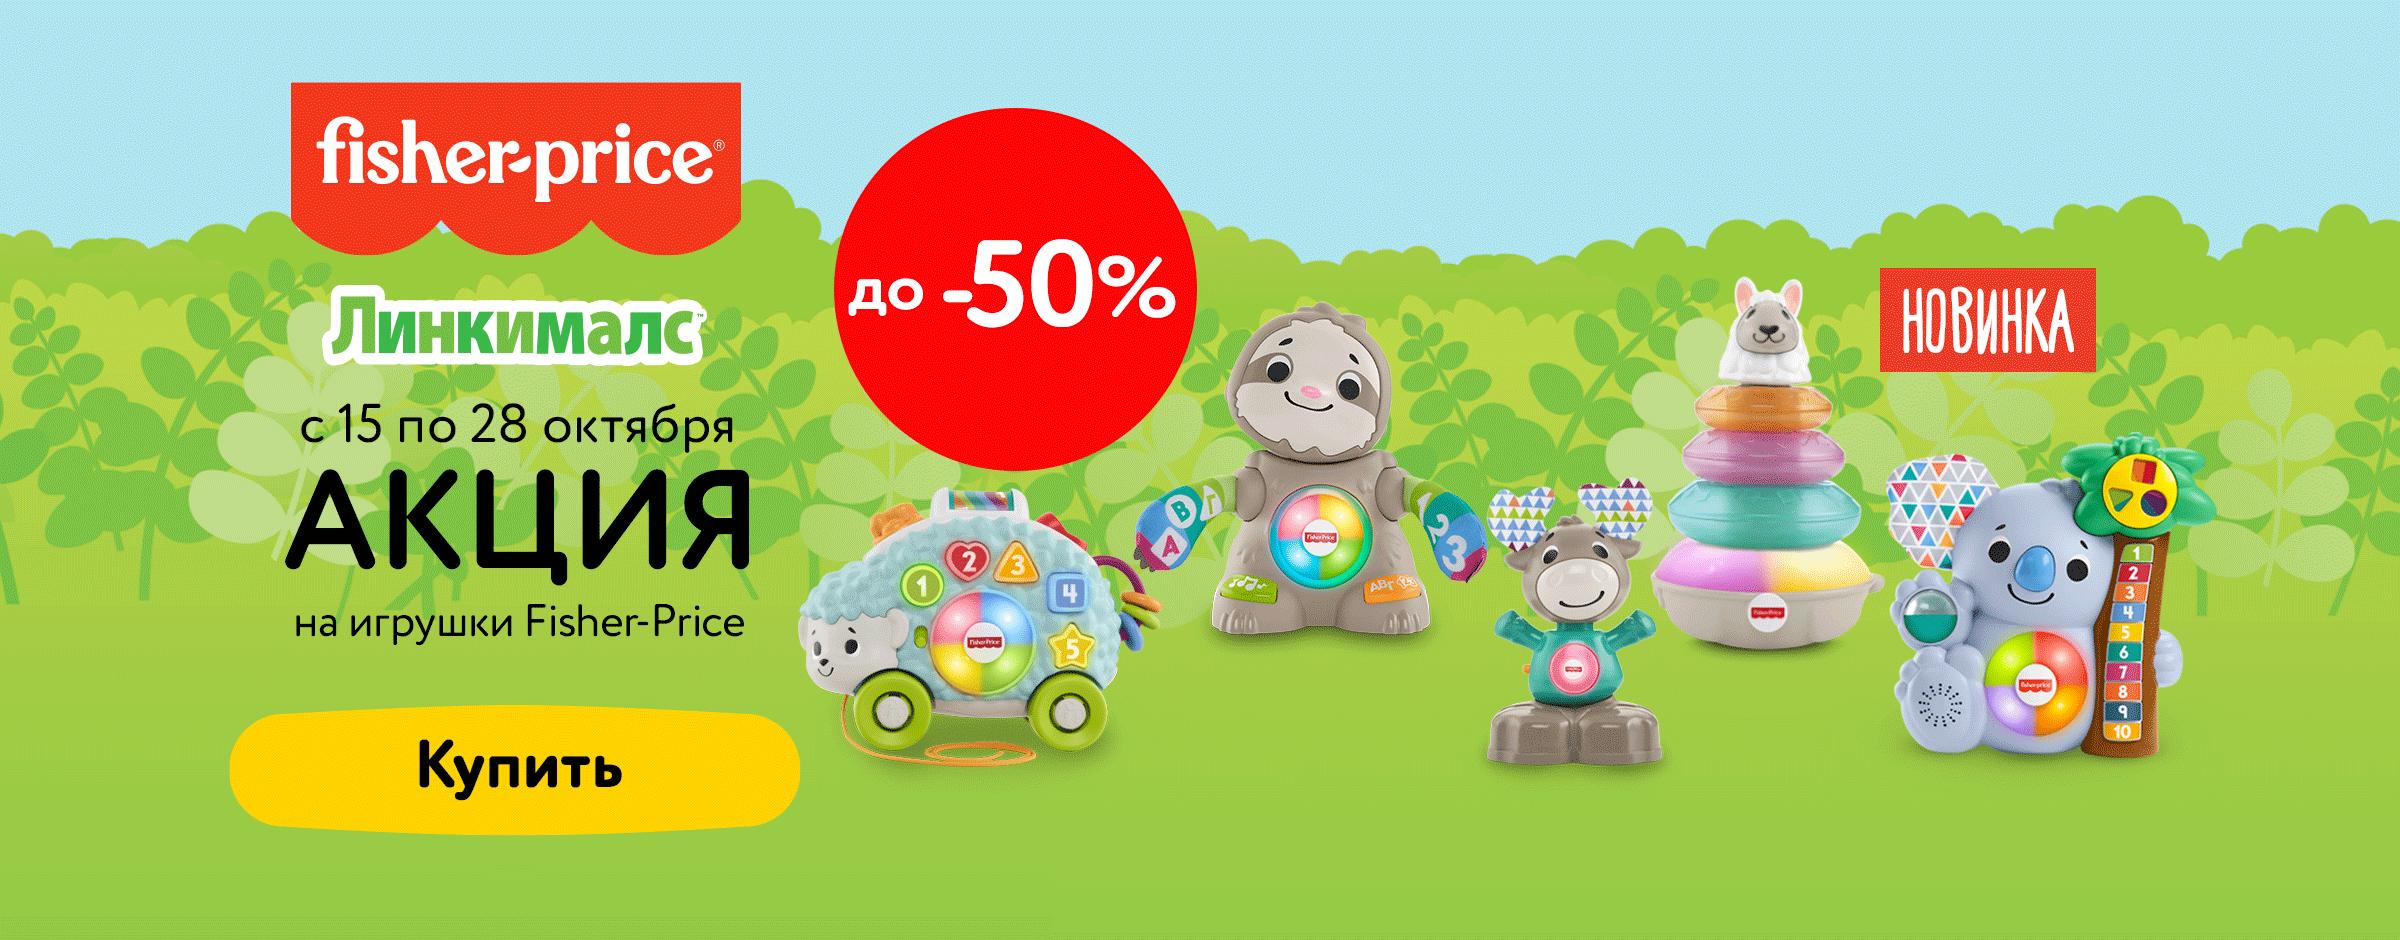 До 50% на игрушки для малышей Fisher Price